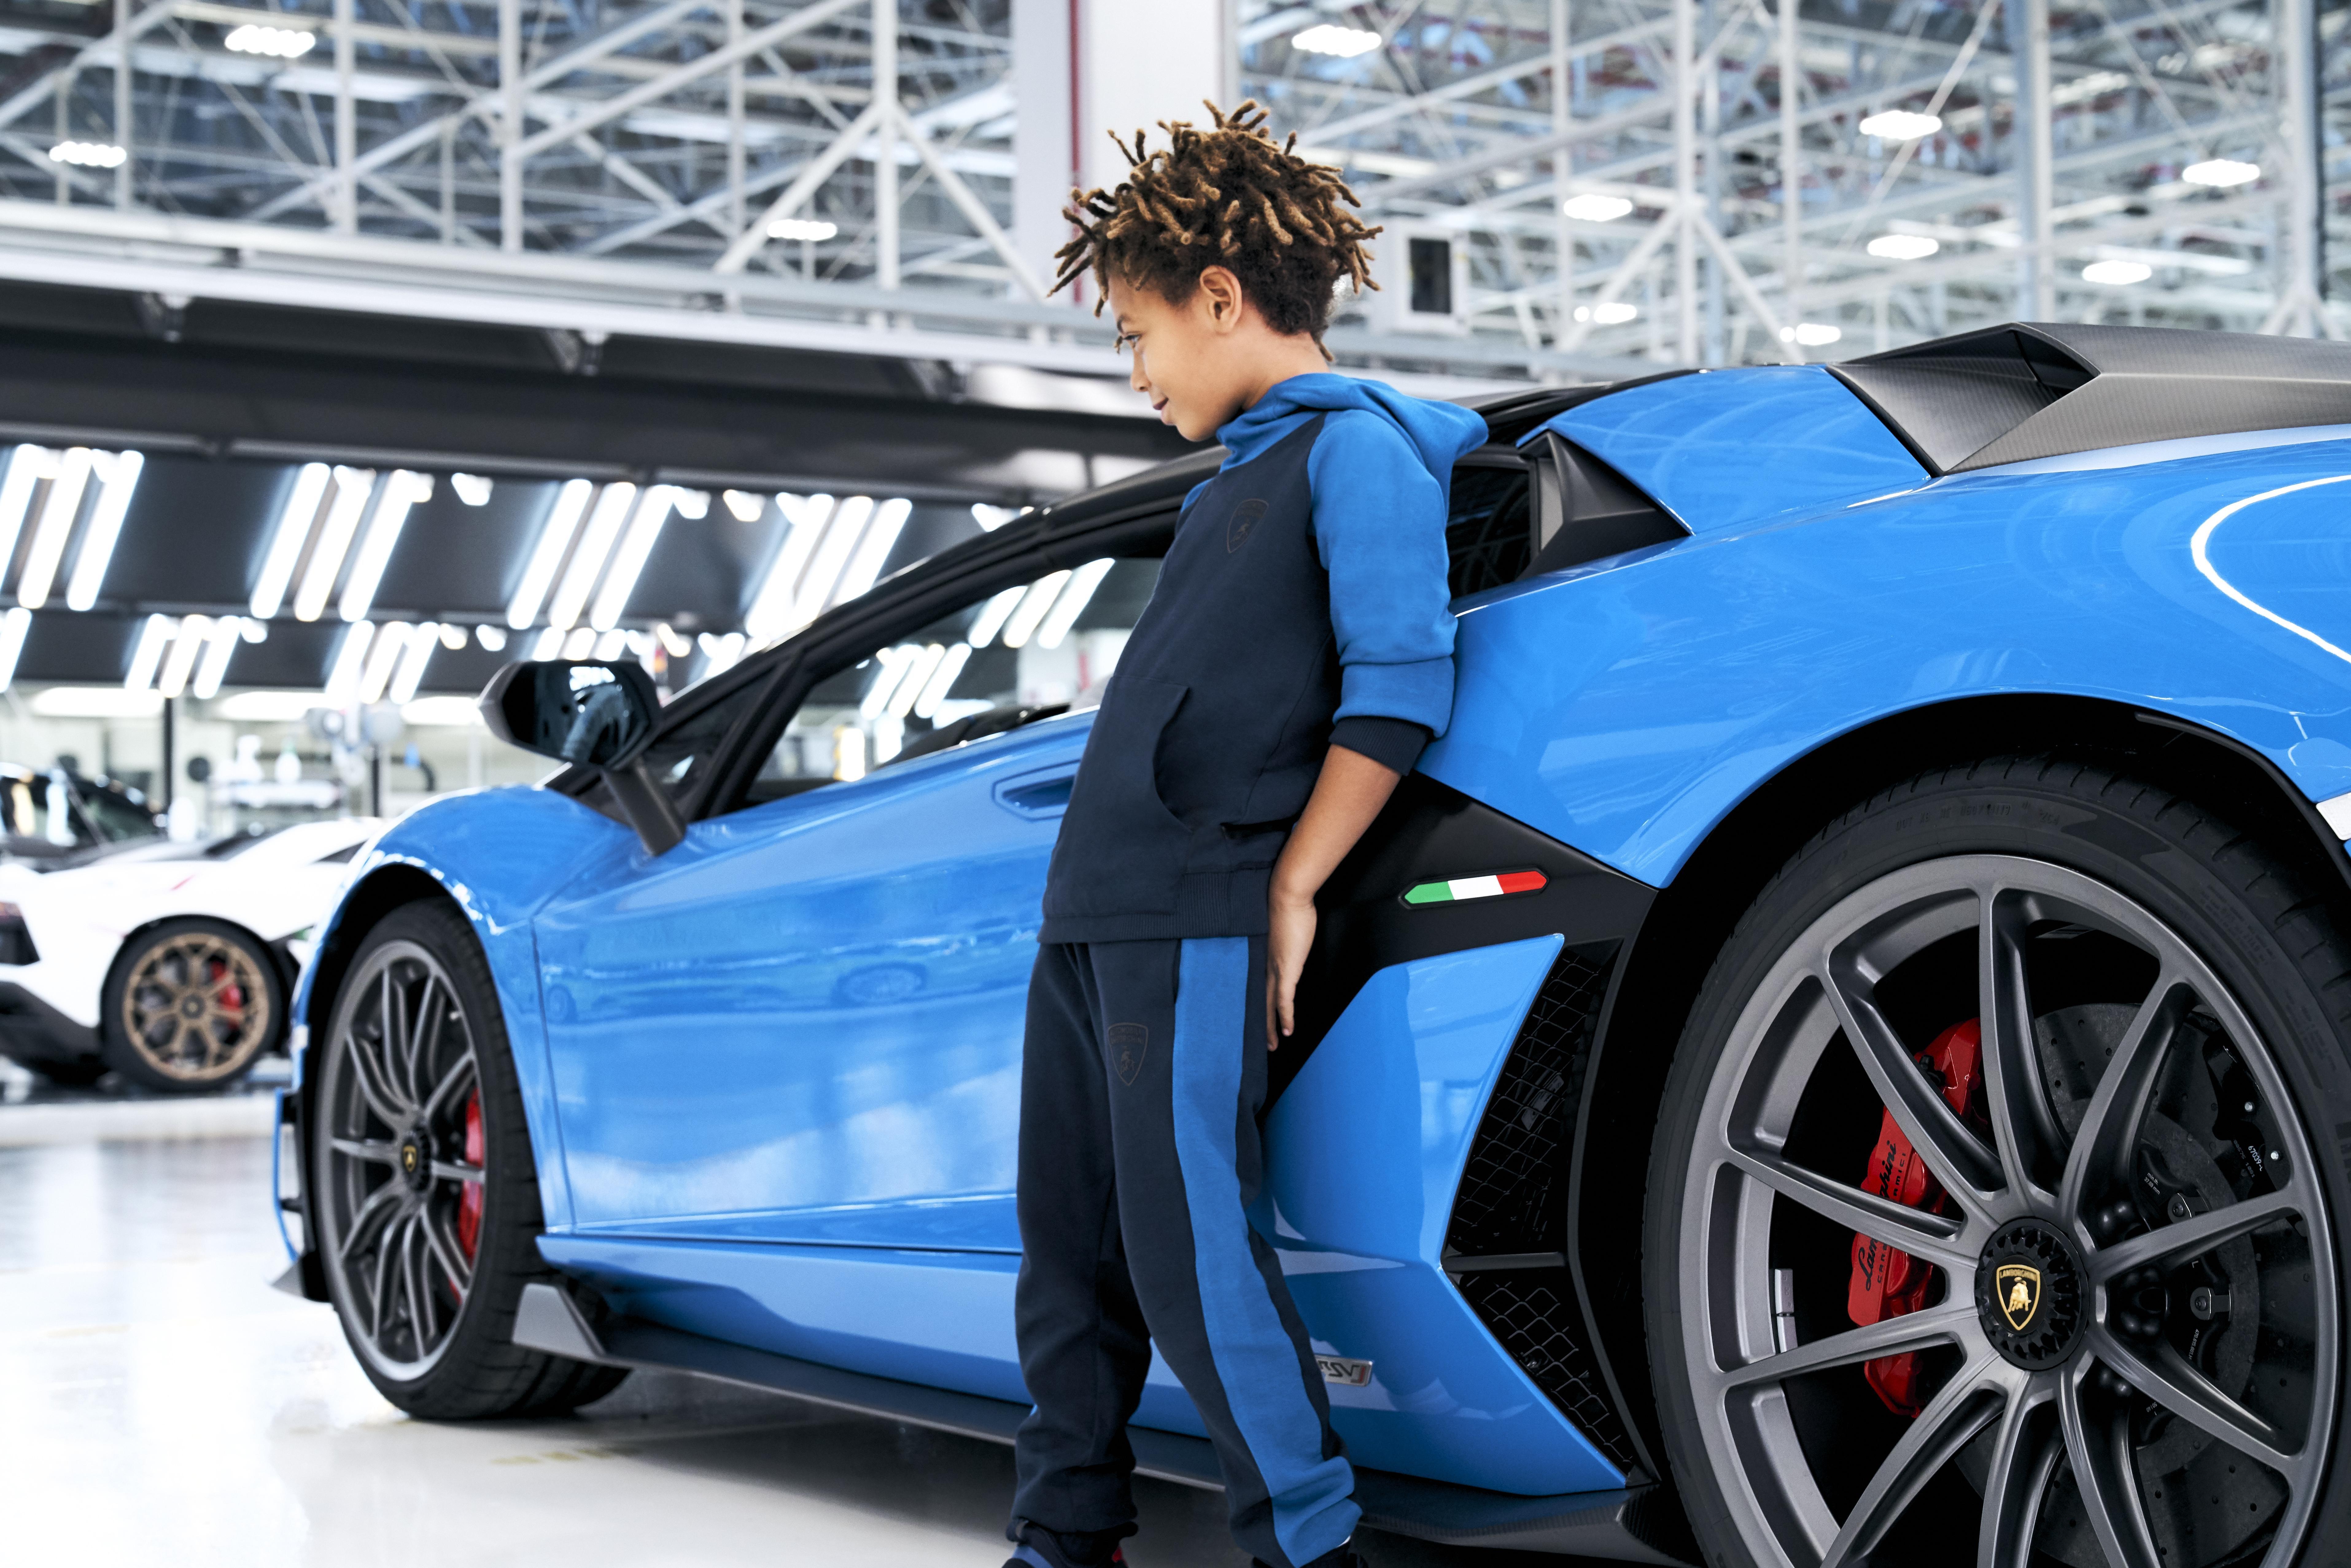 Image 5 Lamborghini.jpg